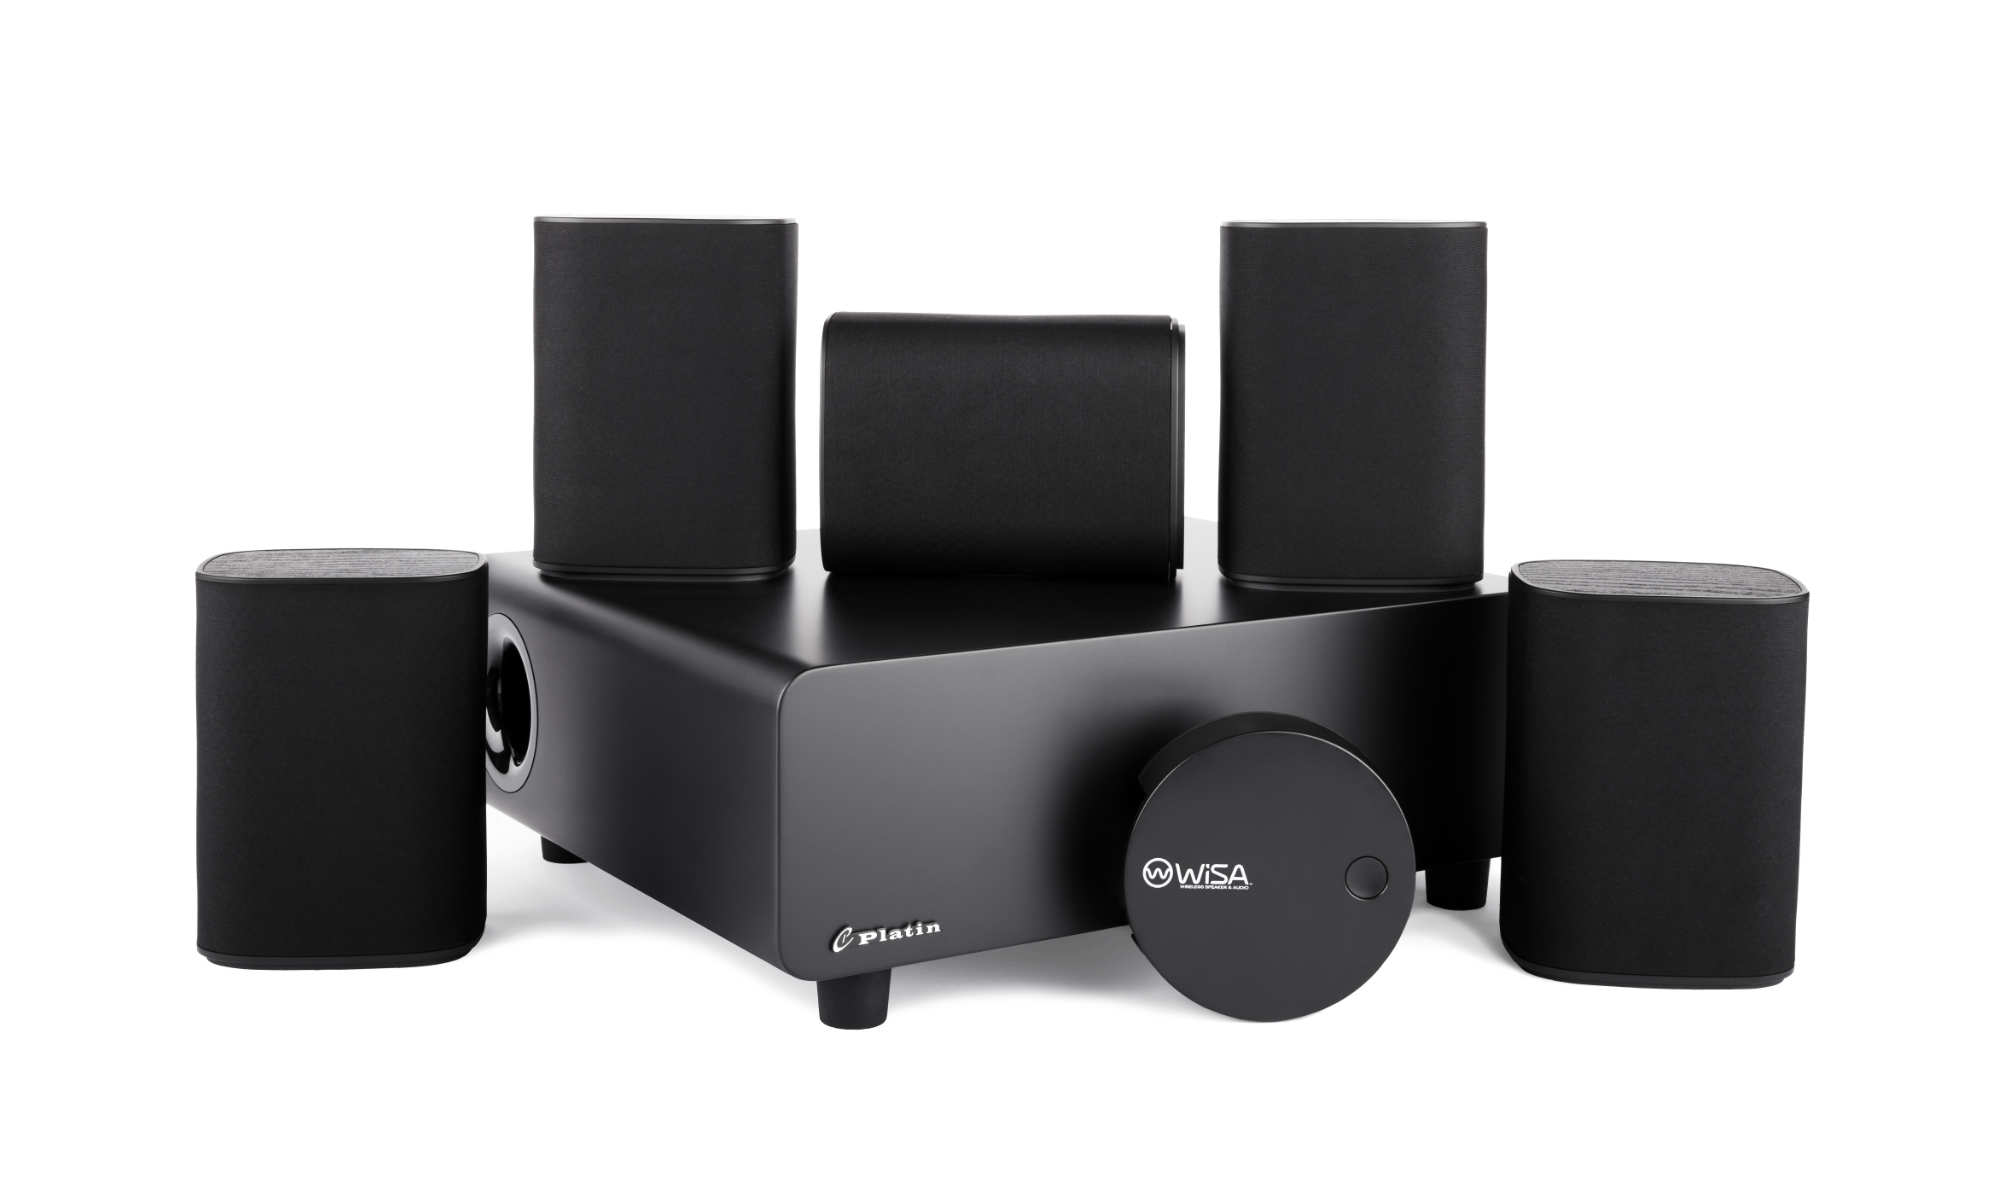 Milan 5.1 speaker systems with WiSA SoundSend Wireless Transmitter